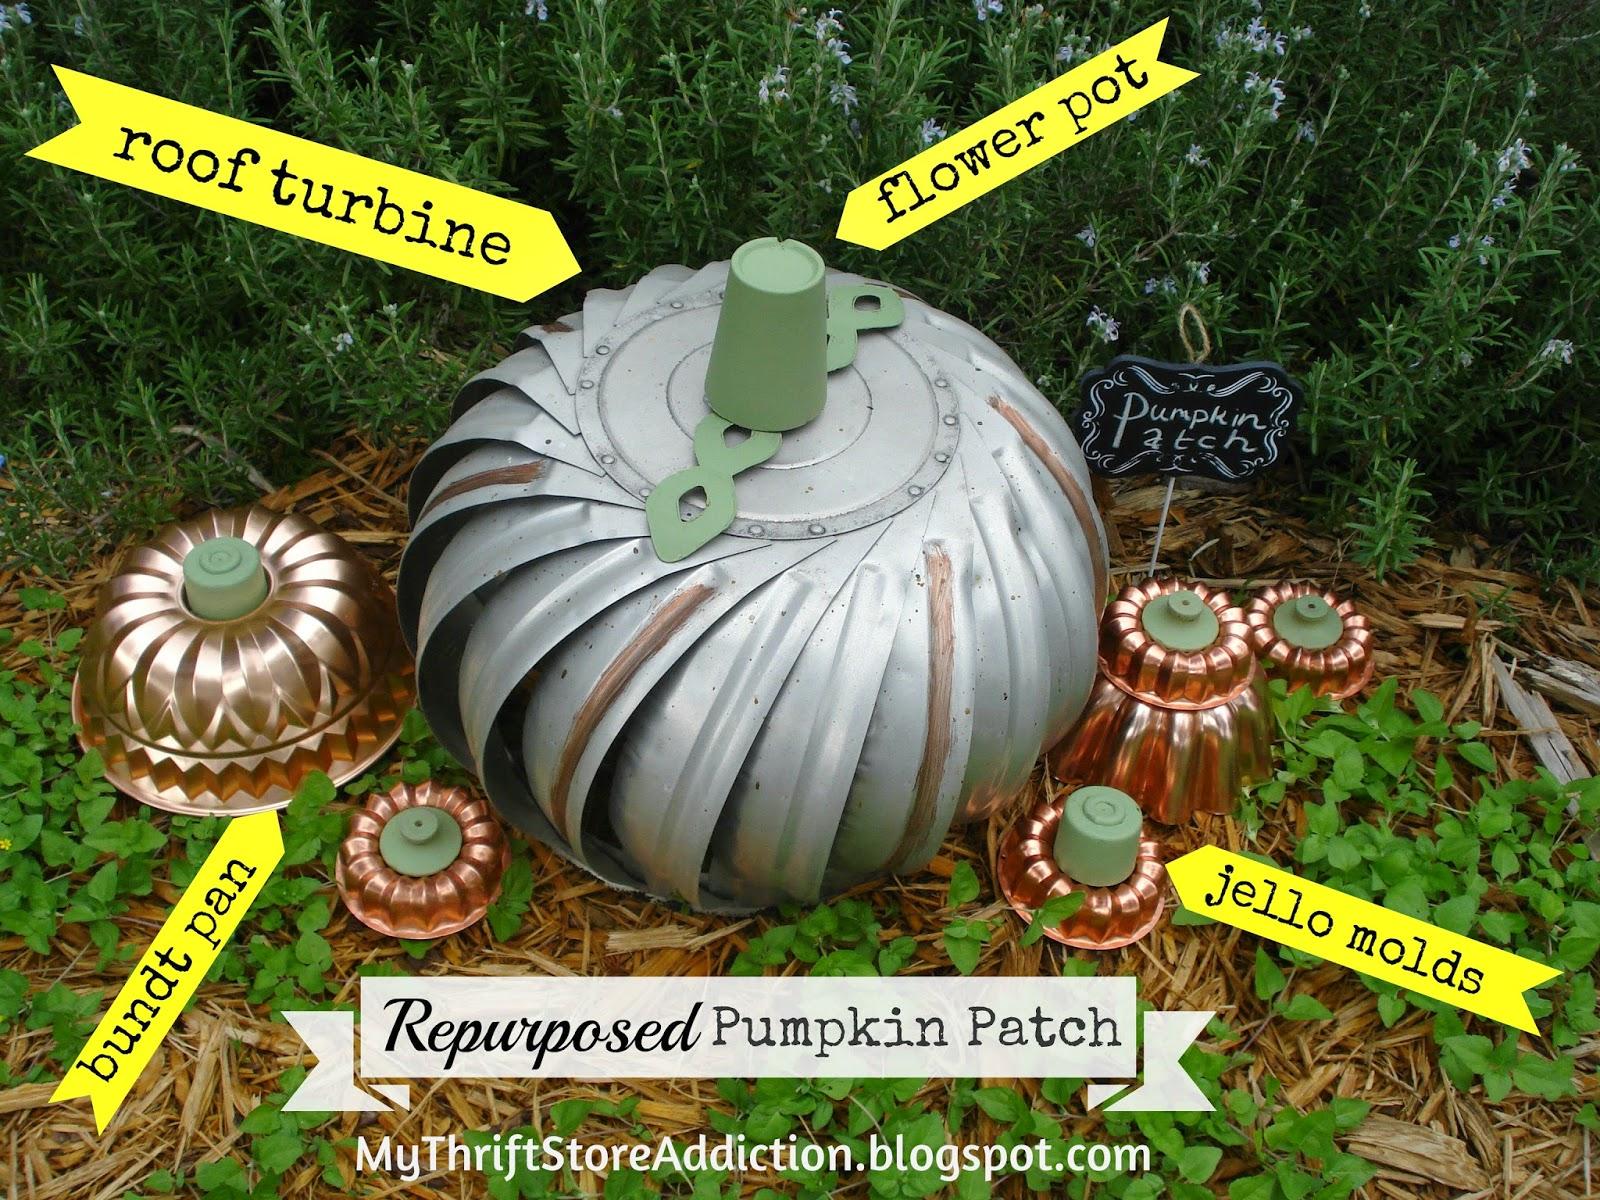 Repurposed pumpkin patch